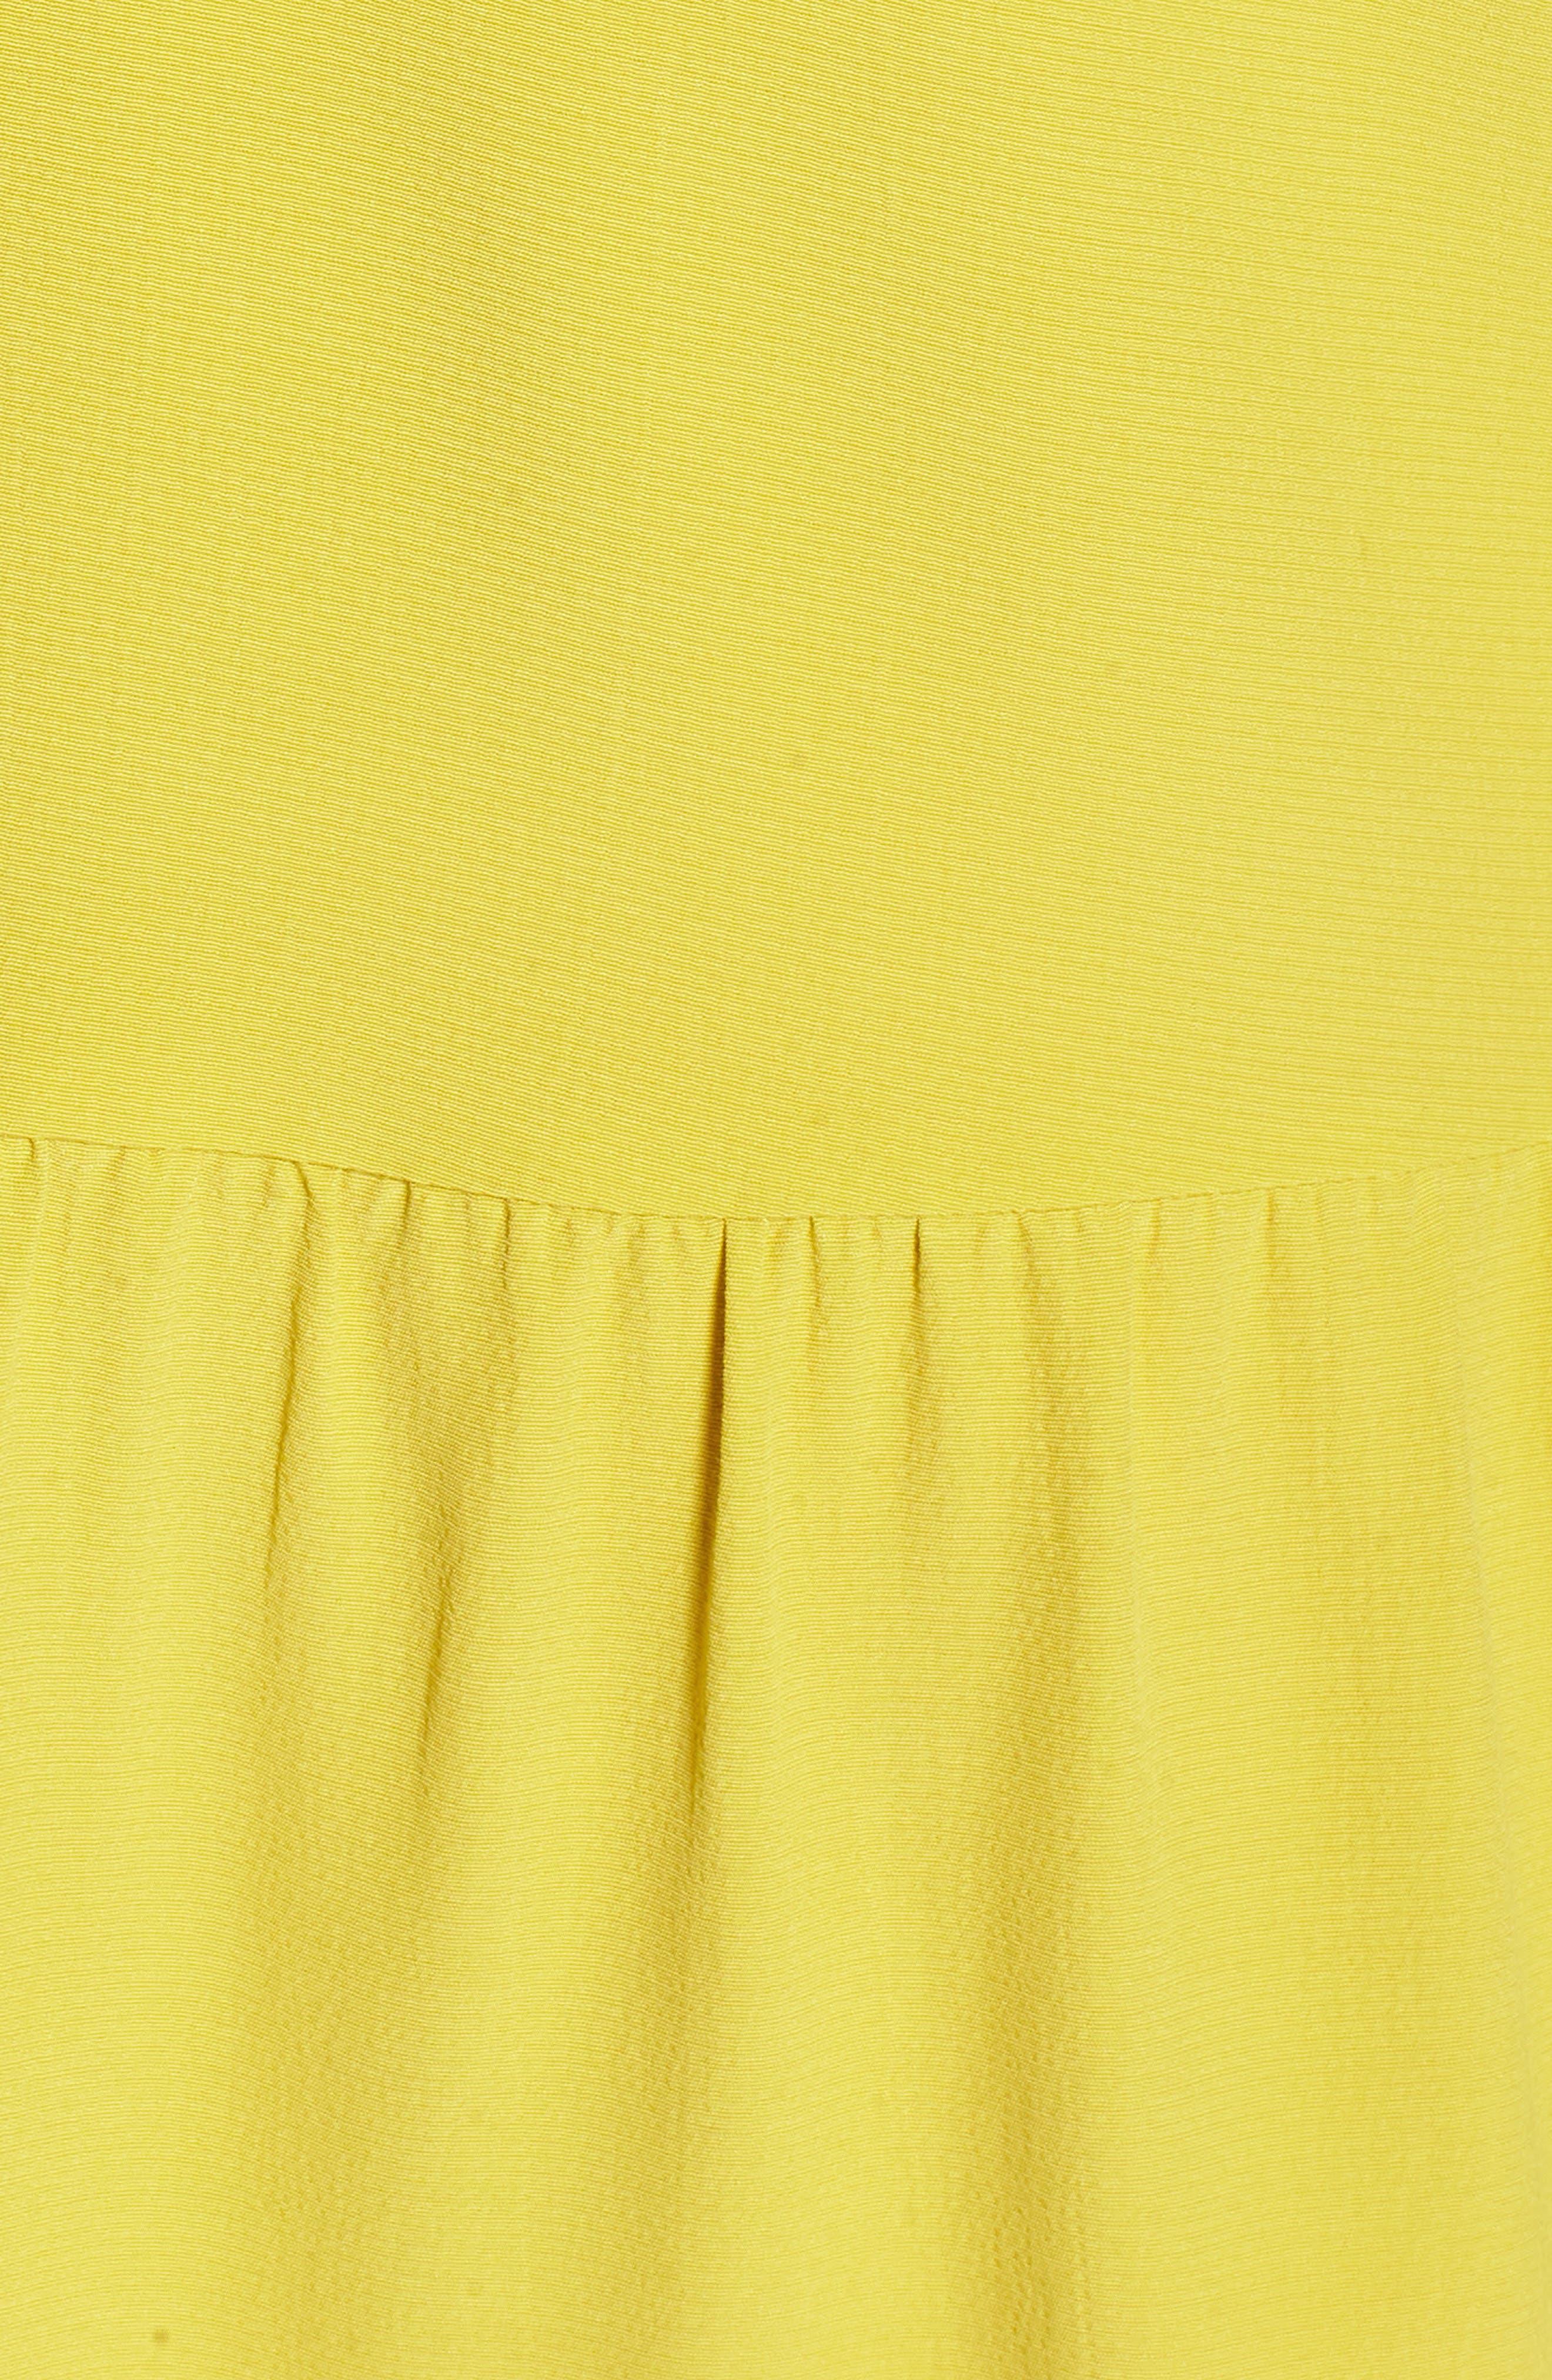 Drop Waist Tencel<sup>®</sup> Lyocell Blend Dress,                             Alternate thumbnail 21, color,